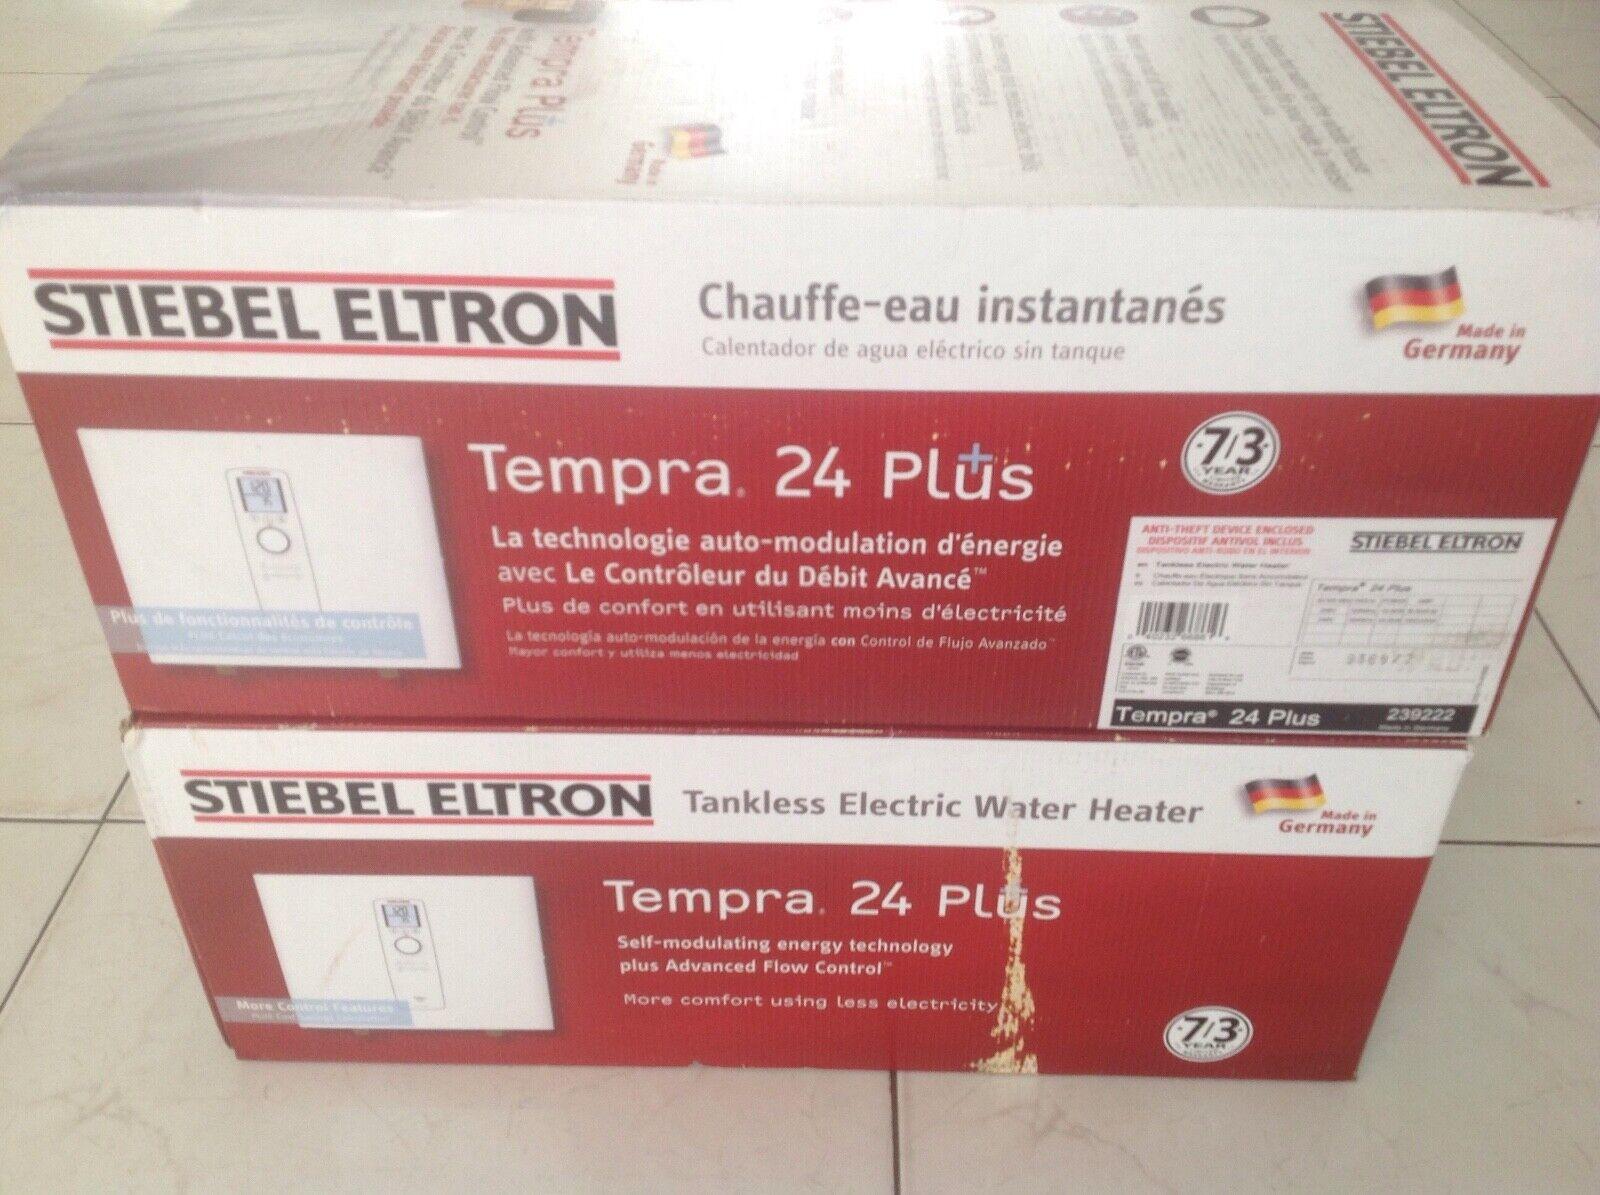 Stiebel Eltron Tempra 24 Plus Tankless Electric Water Heater